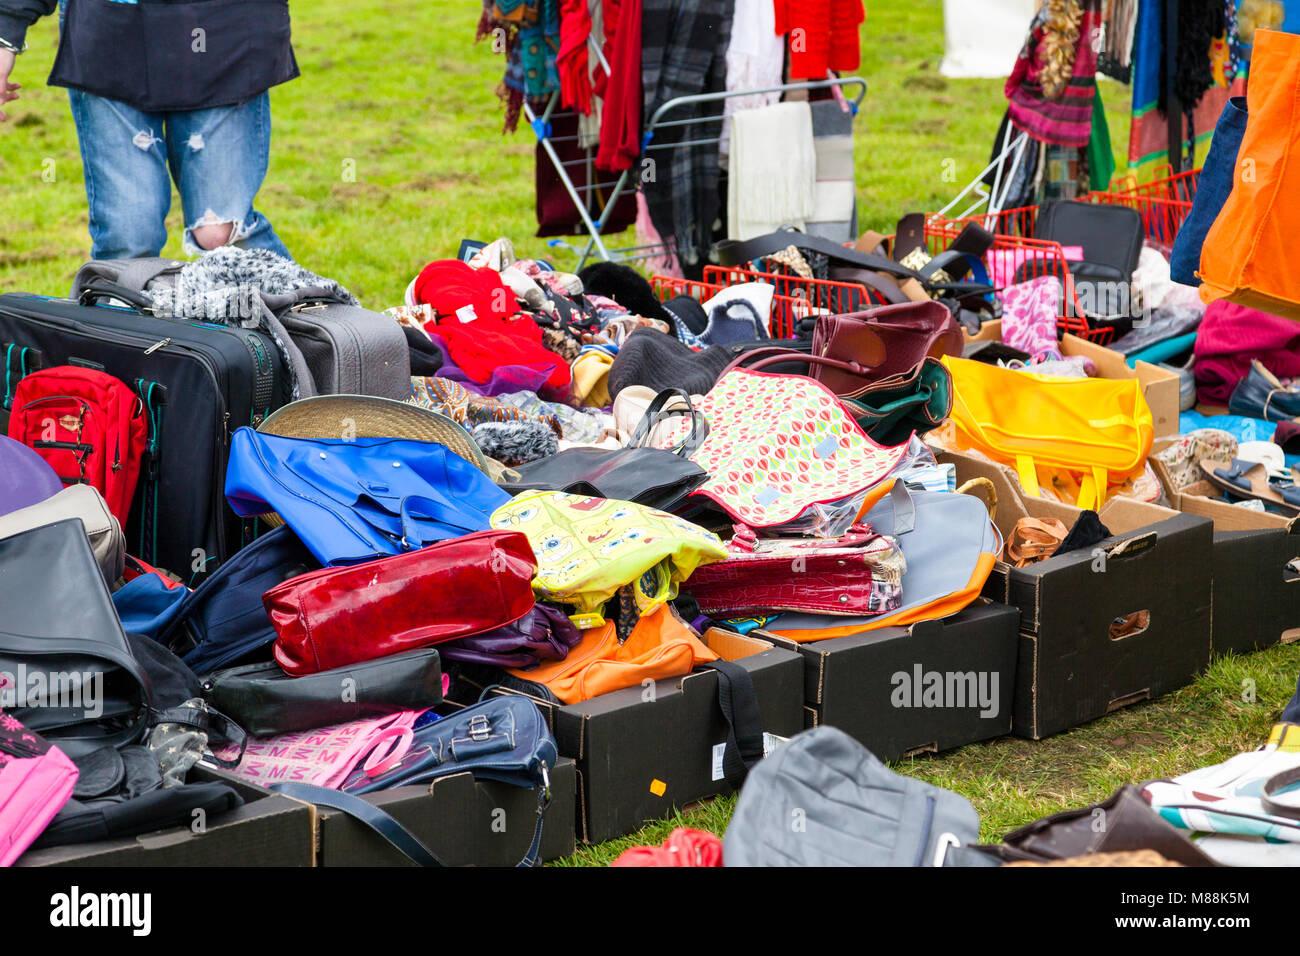 jumble sale, village of hamstreet, ashford, kent, uk - Stock Image